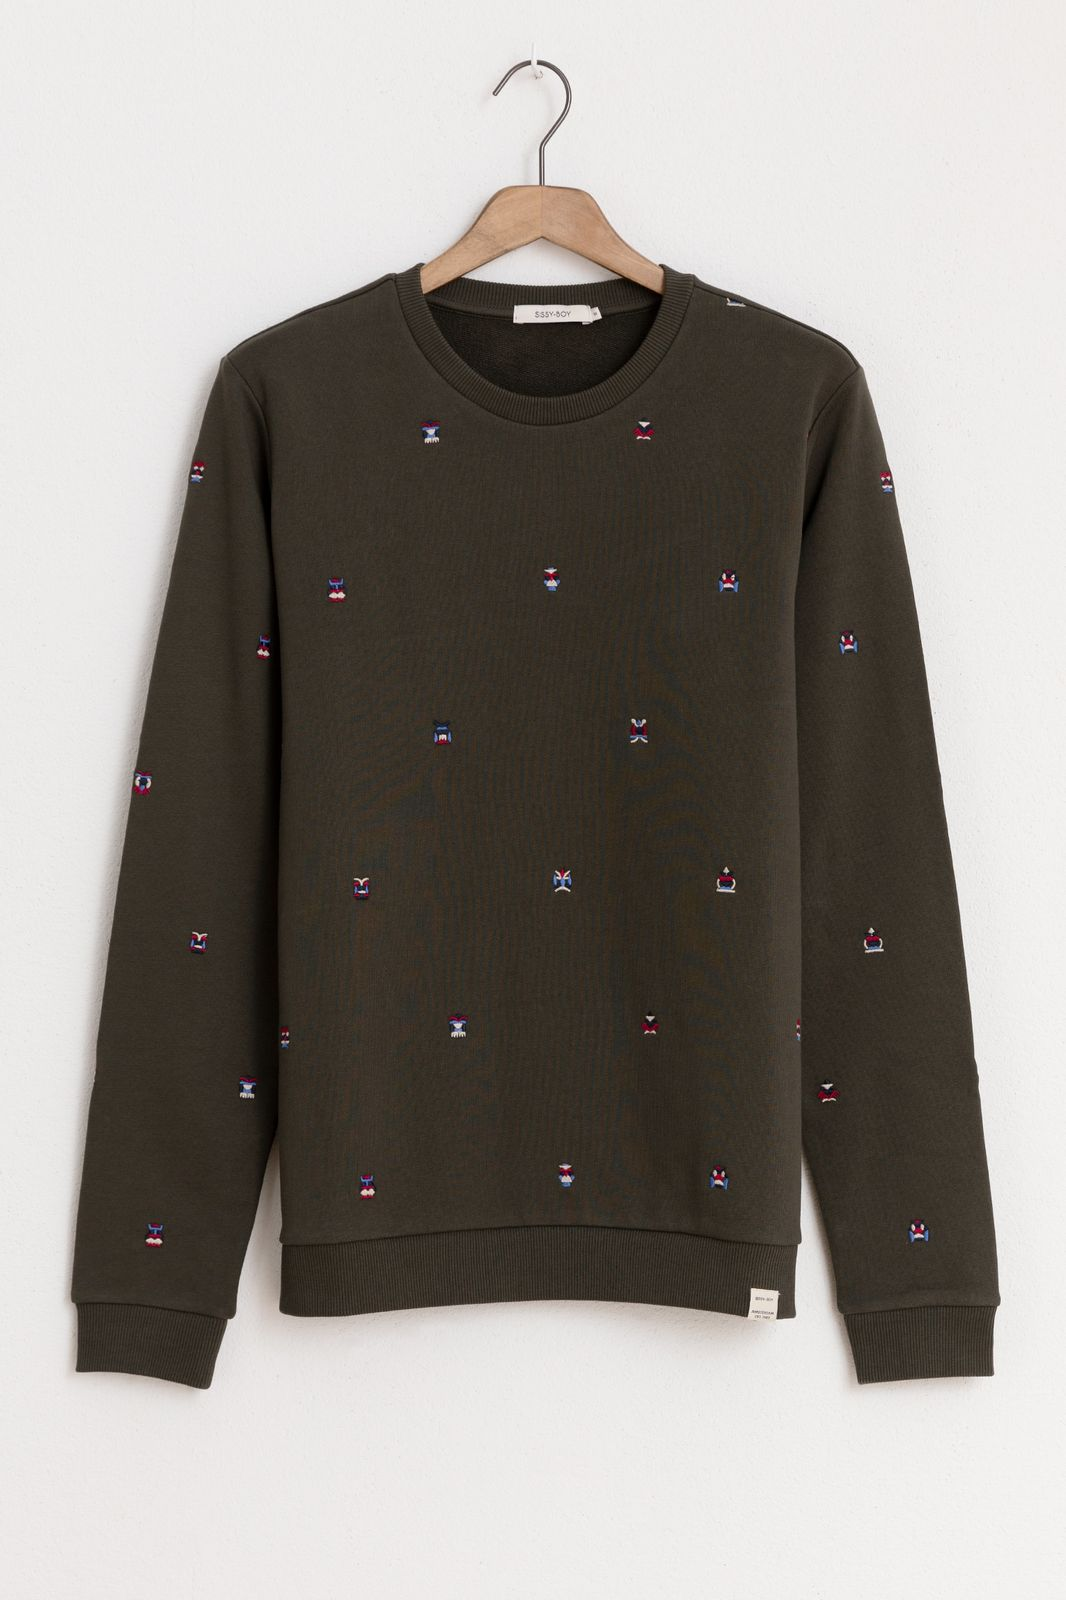 Donkergroene sweater met borduursels - Heren   Sissy-Boy